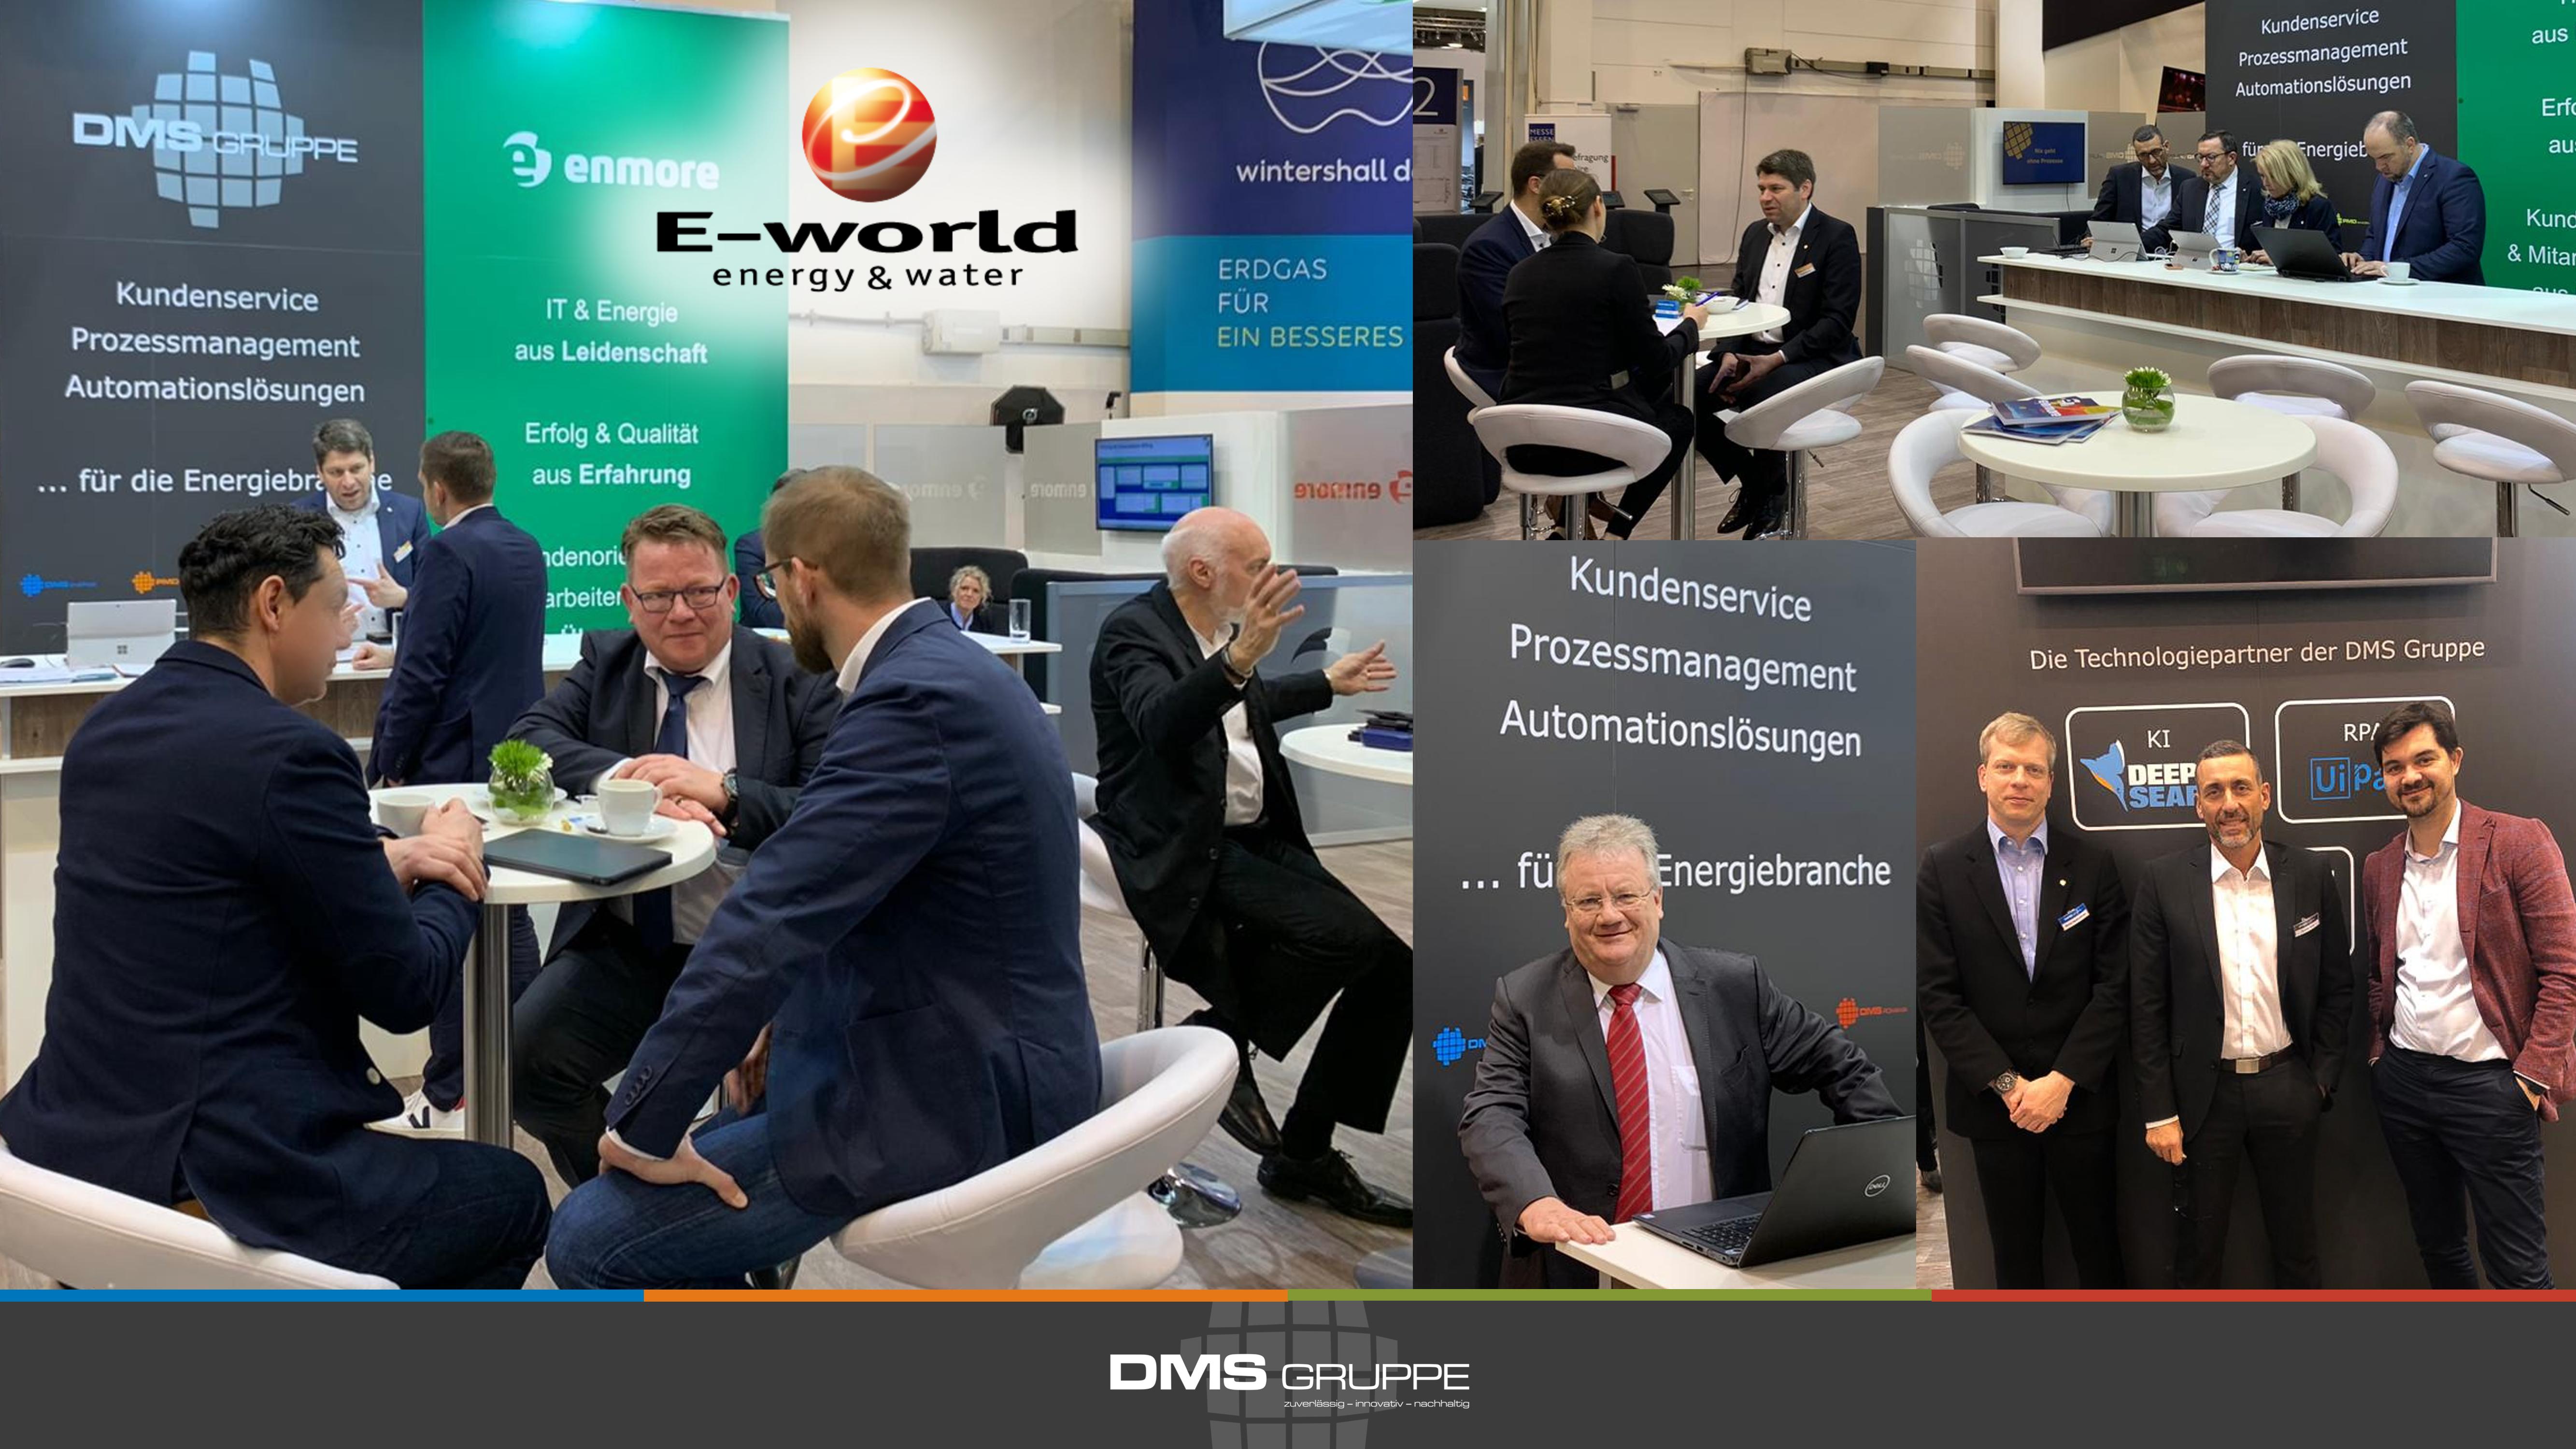 DMS Gruppe @ E-world 2020: Rückblick